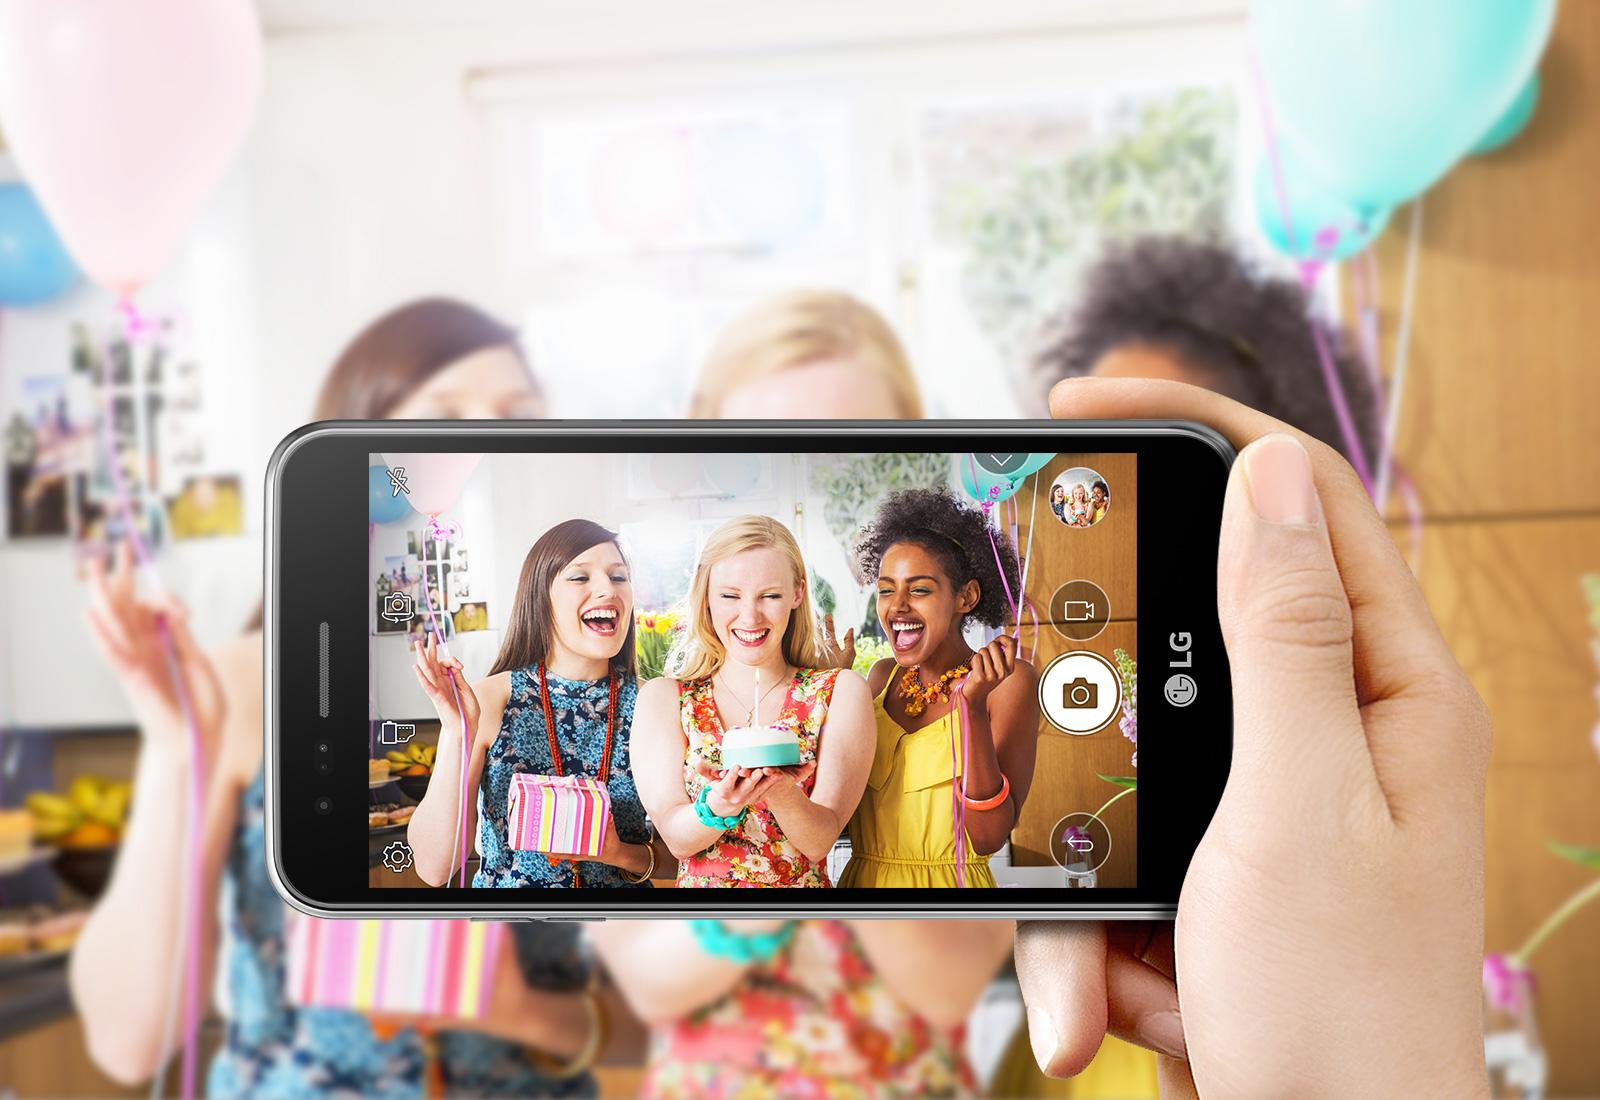 8mp rear camera 1600x1100 K4 M01A LG Launches Budget K4 Smartphone